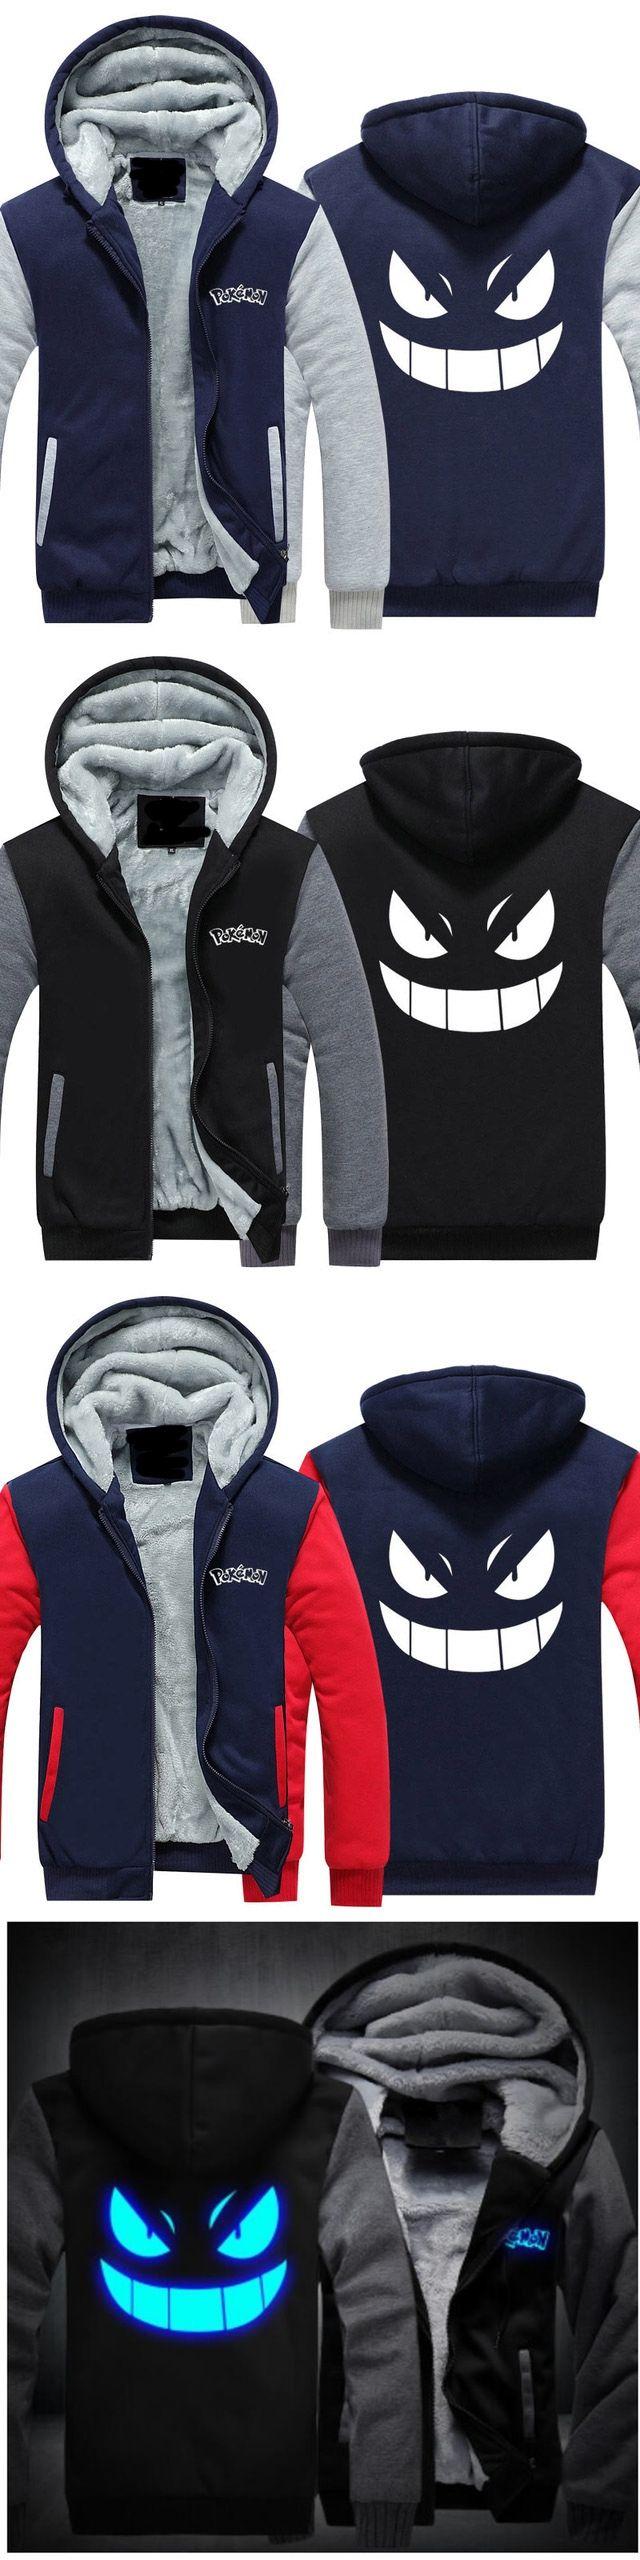 2018 Men Women Hoodies Pocket Monster Anime Gengar Pokemon Hip Hop Sweatshirts Zipper Fleece Tracksuits USA EU Size